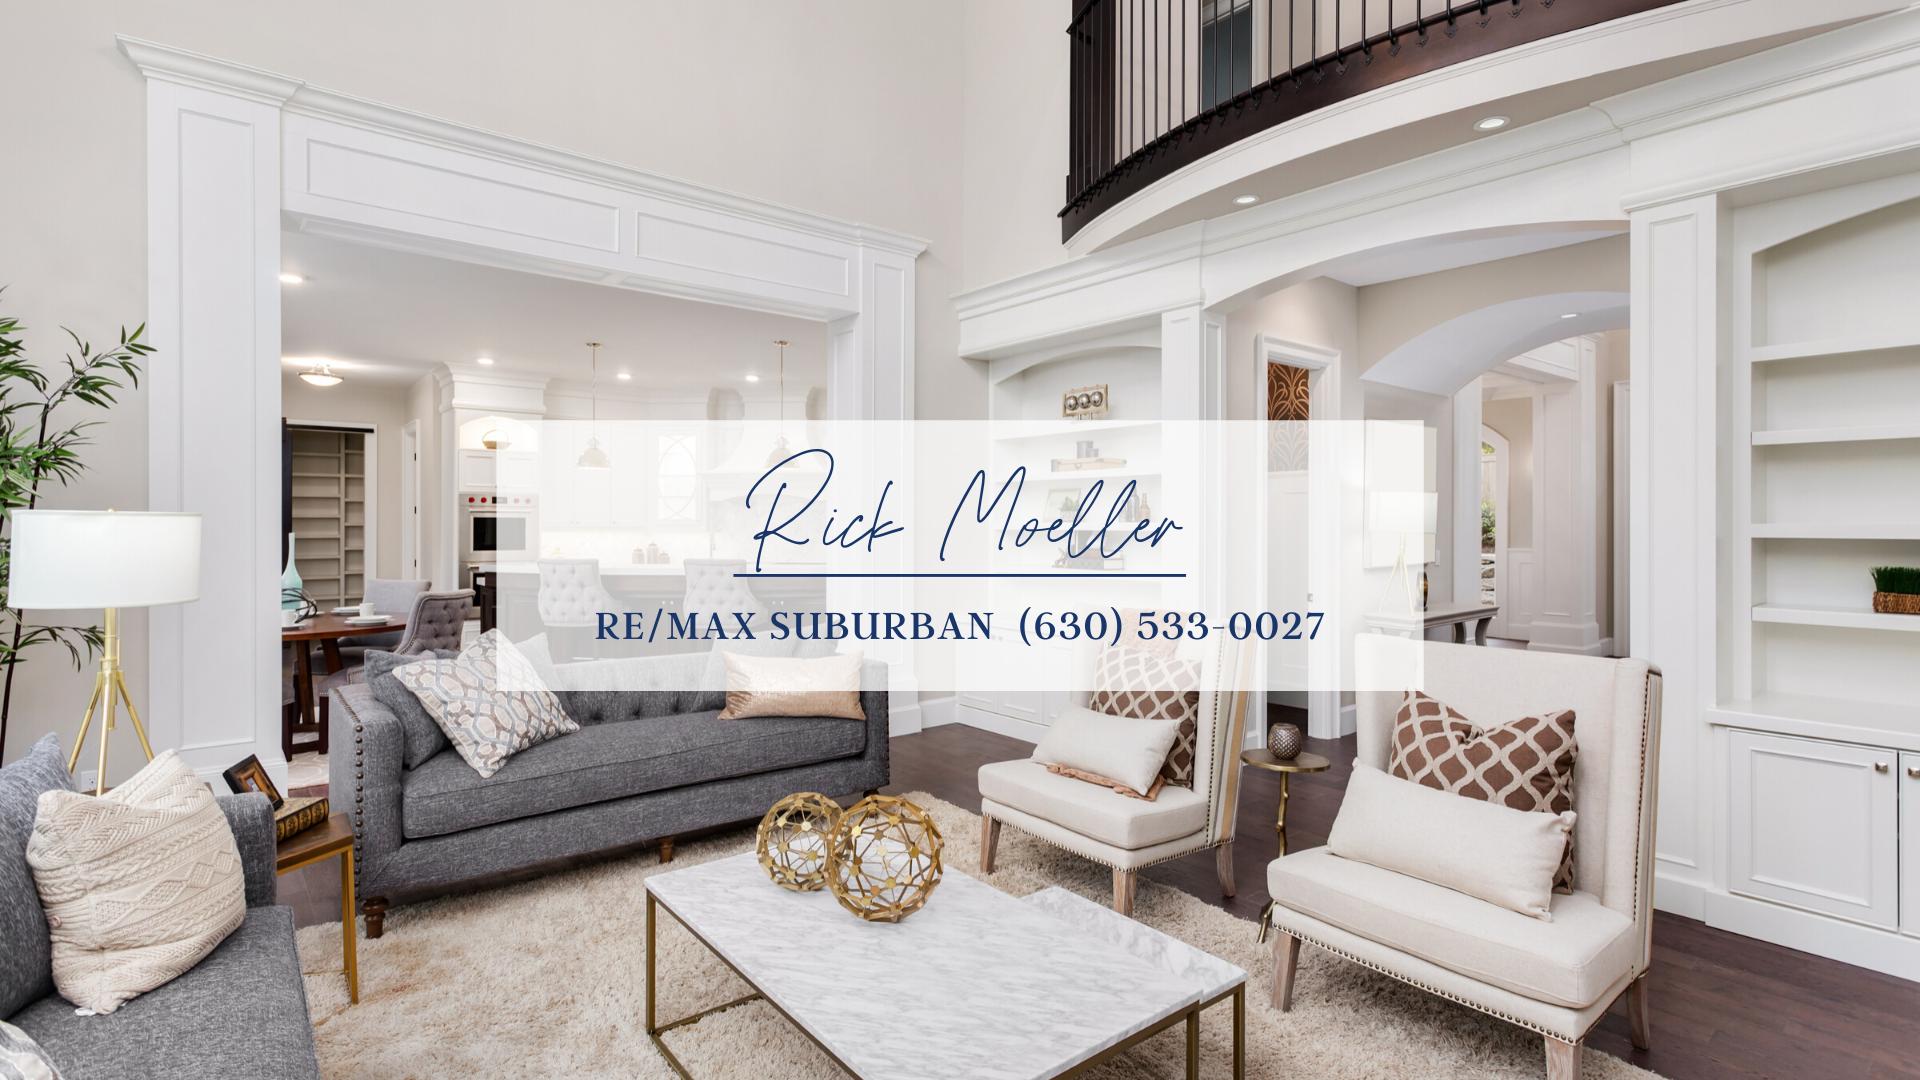 Rick Moeller - RE/MAX